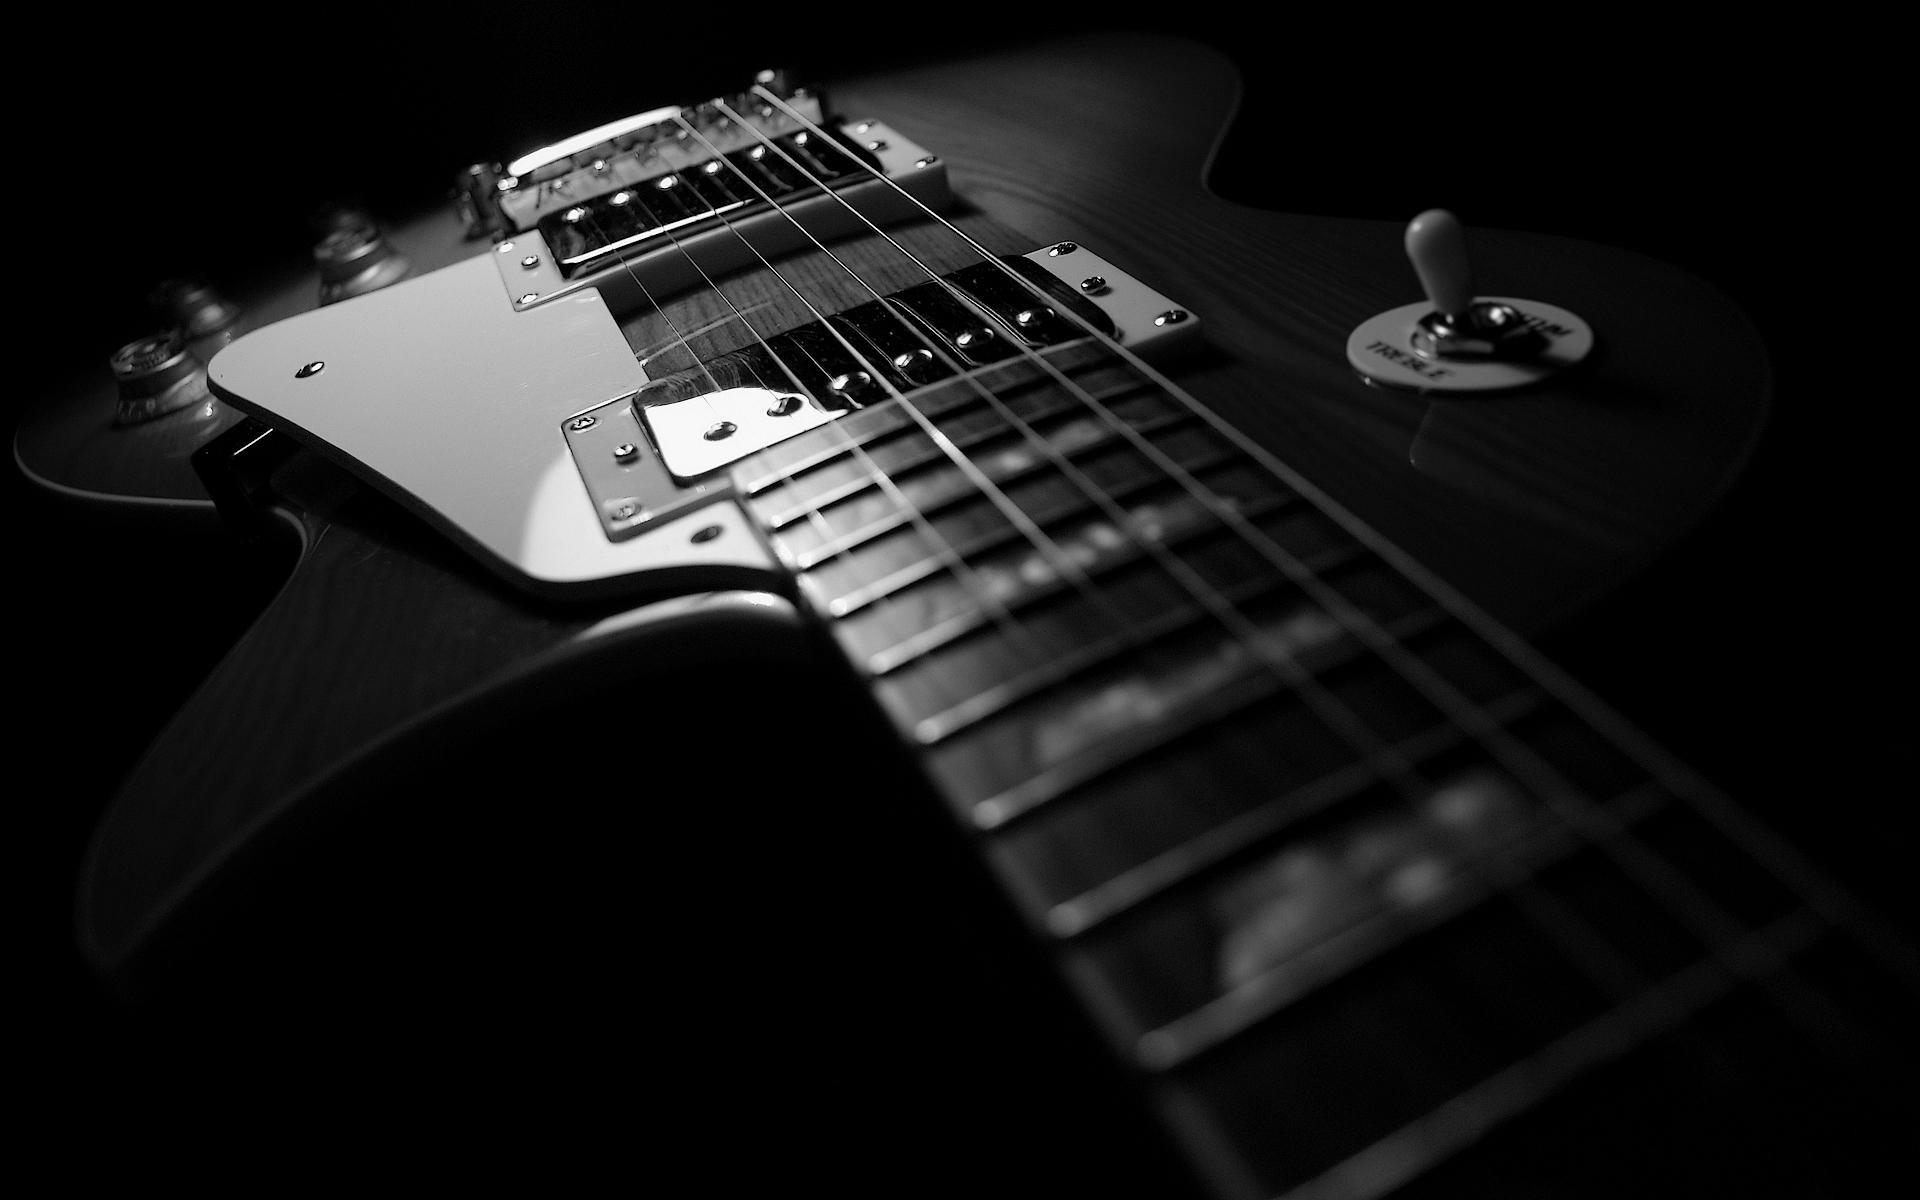 Electric Guitar Wallpaper 1920x1200